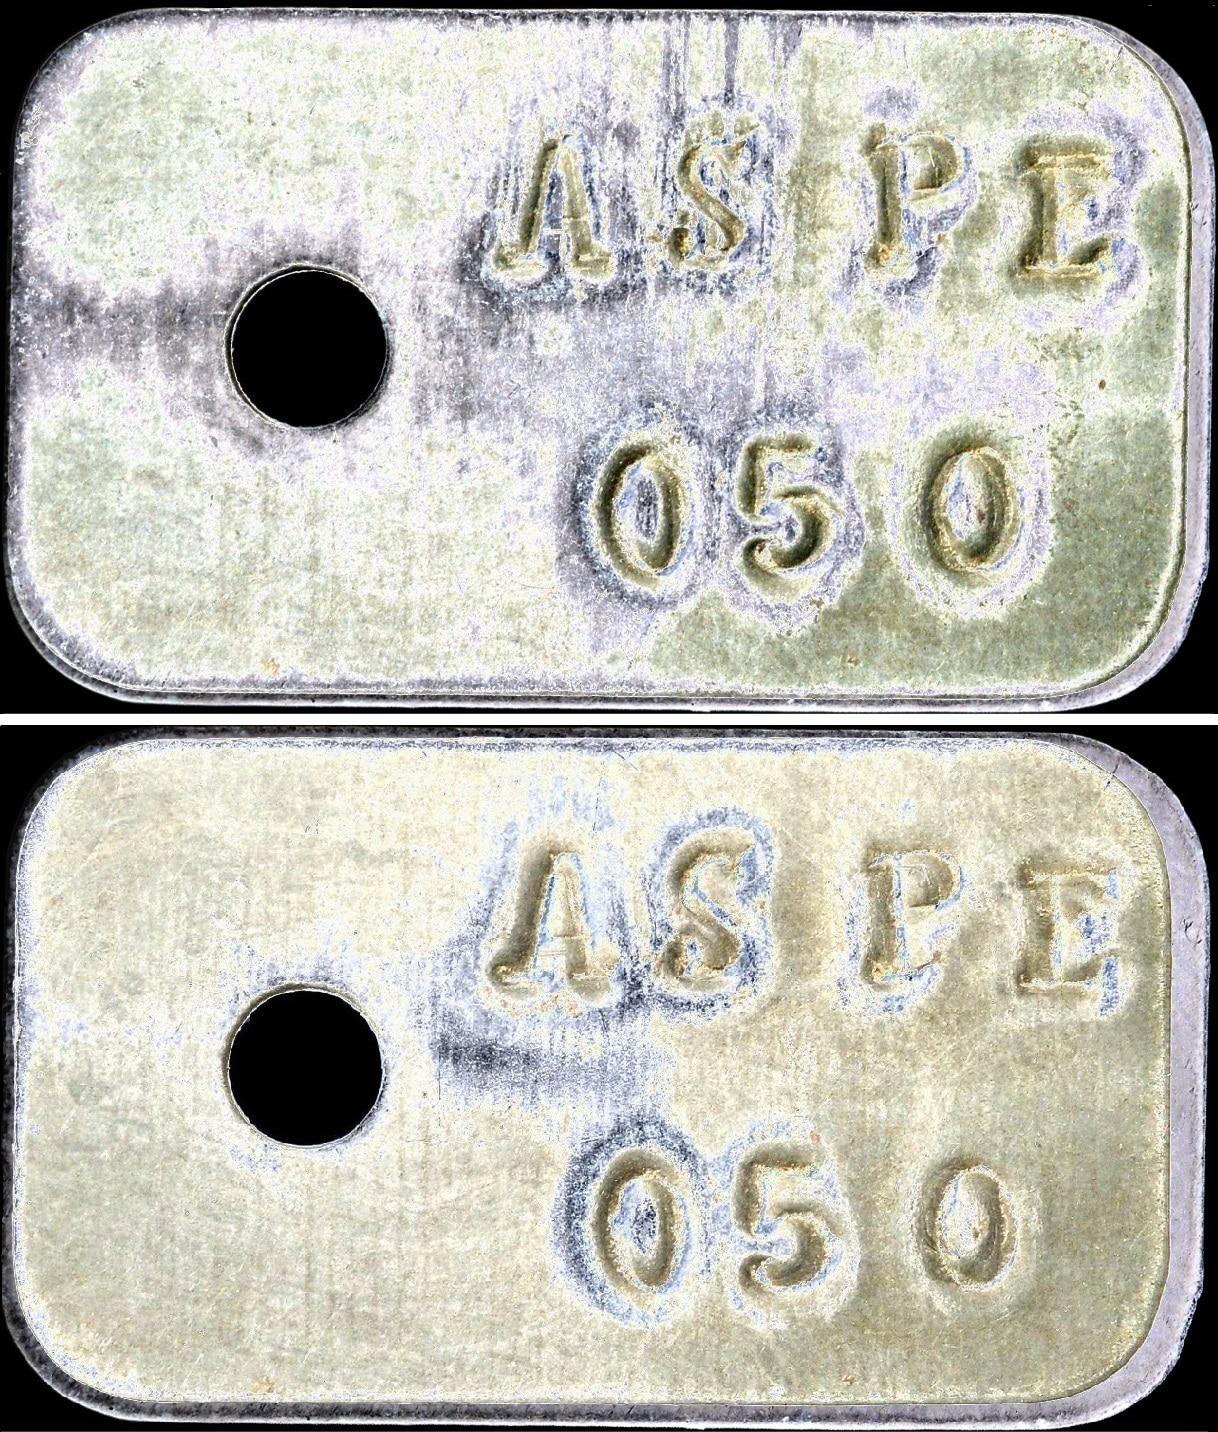 50 céntimos de Aspe. Guerra Civil Española. Comparacion_jesusdelrio_Ovelleiro